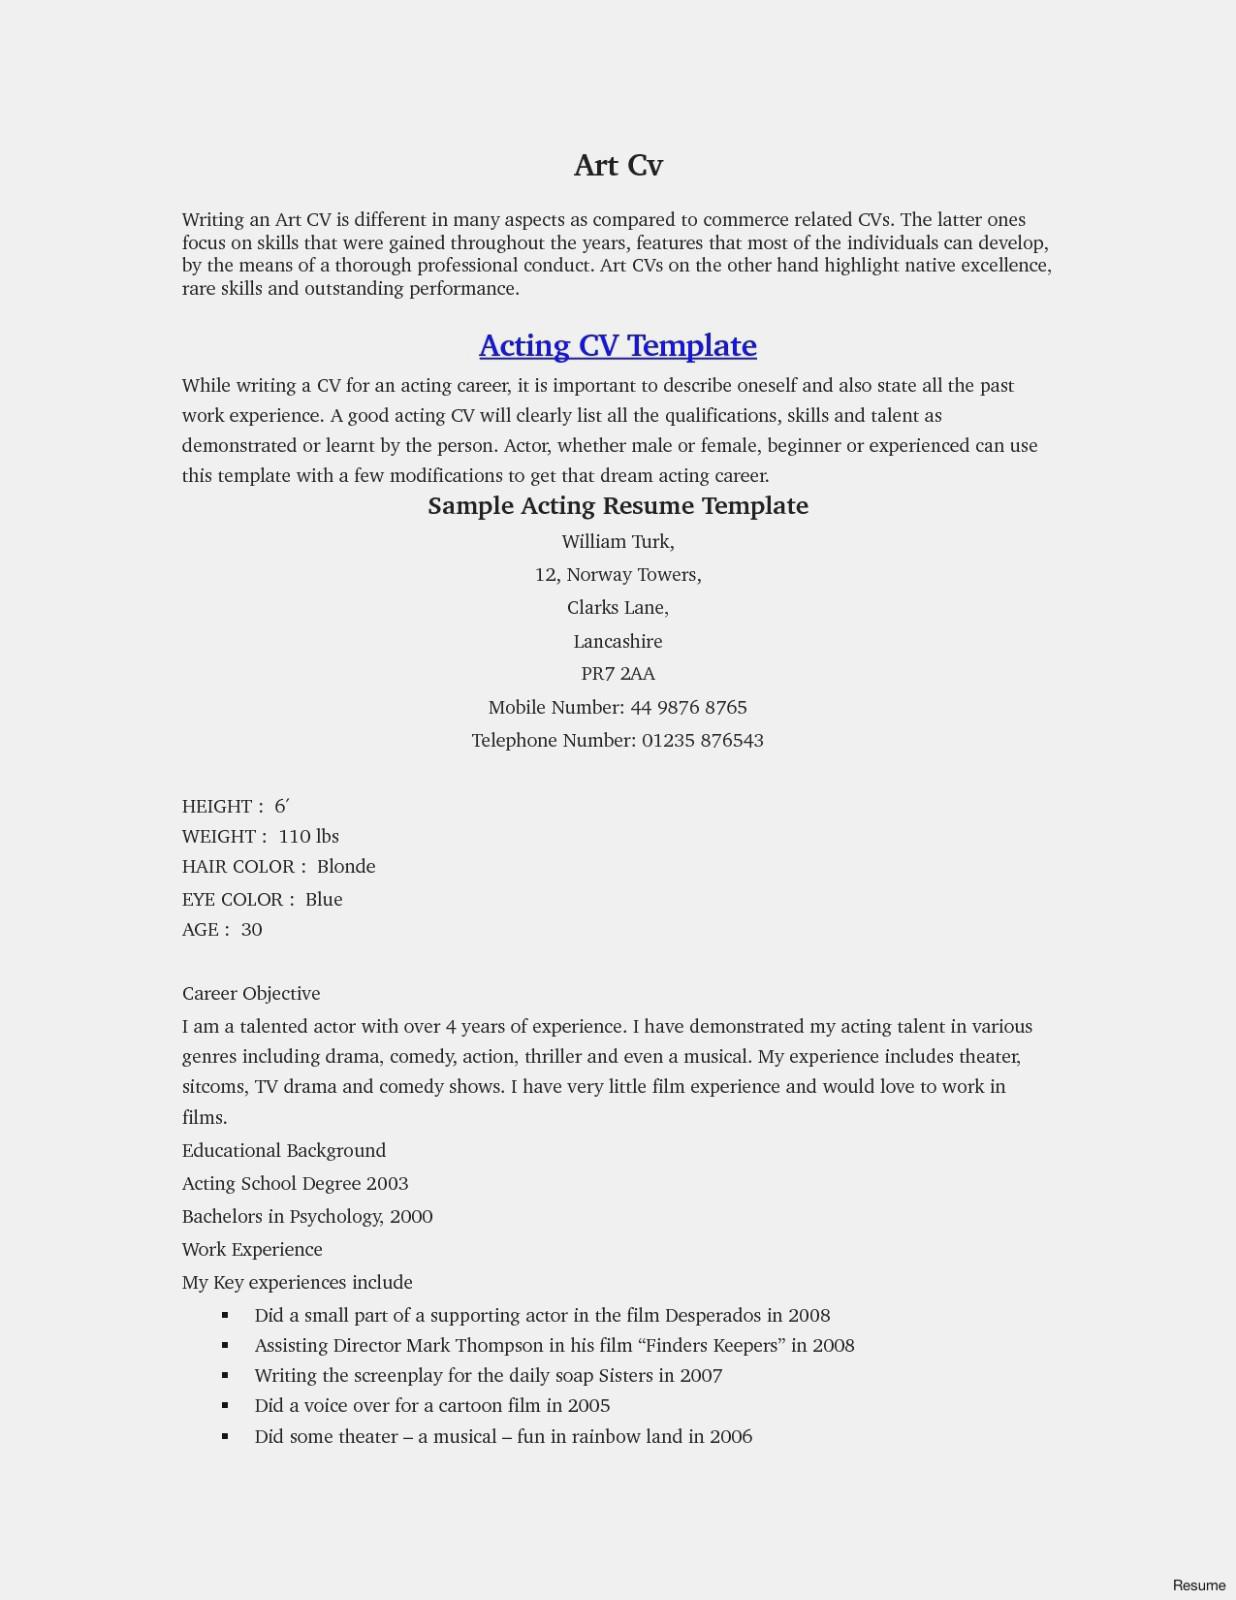 beginner acting resume template beginner actor resume template beginner acting resume template word beginner actor resume template word beginners acting resume template no experience sample beginner resume template beginner student resume template 2020 beginning teacher resume template beginning acting